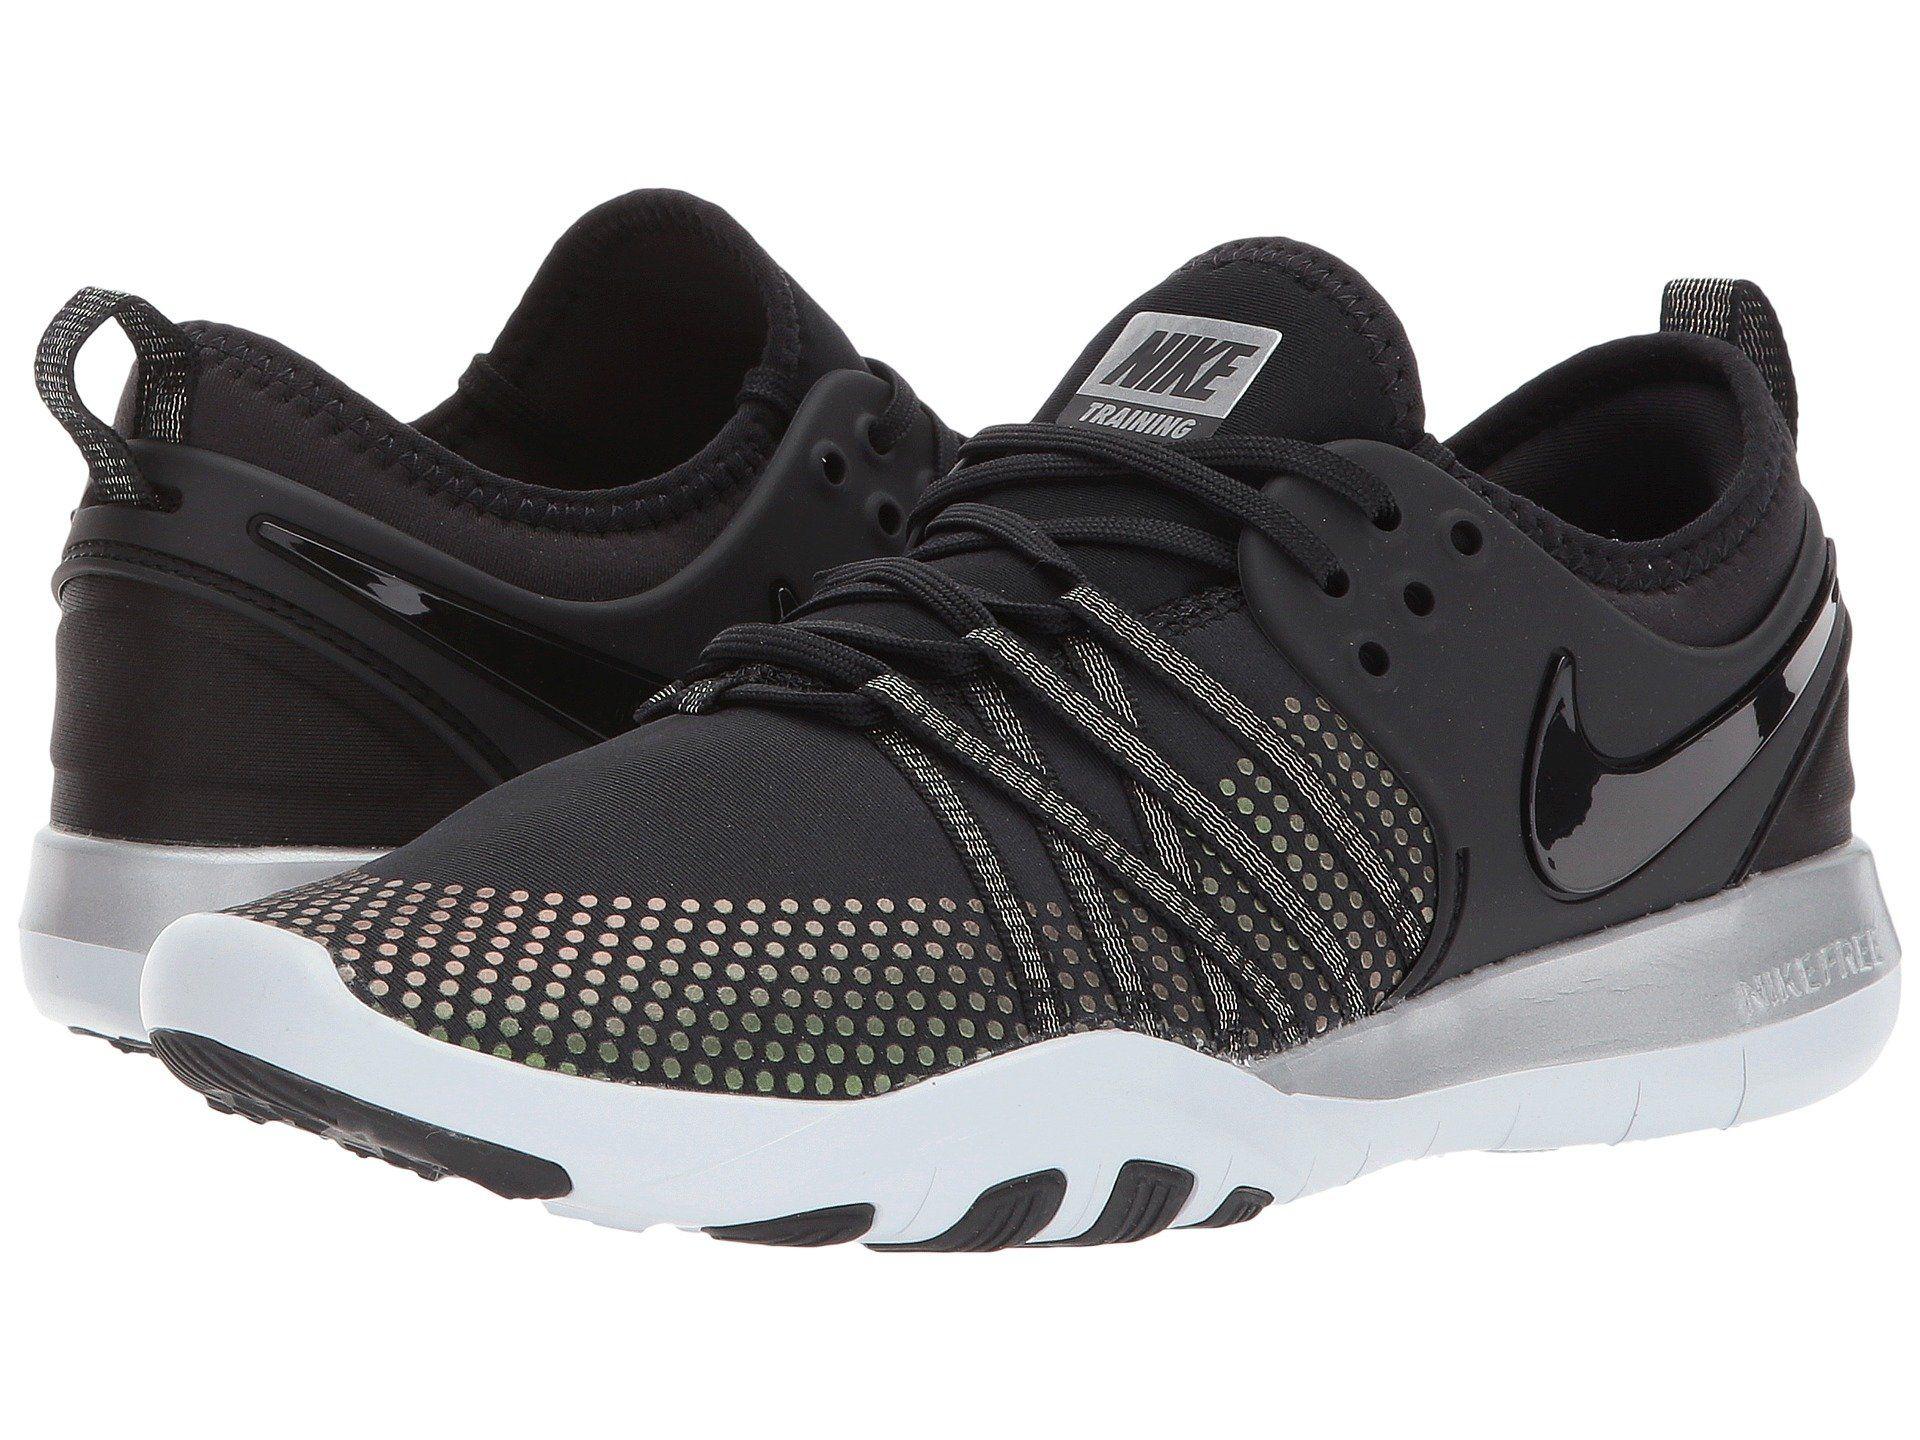 Nike Free Tr 7 Metallic In Black/black